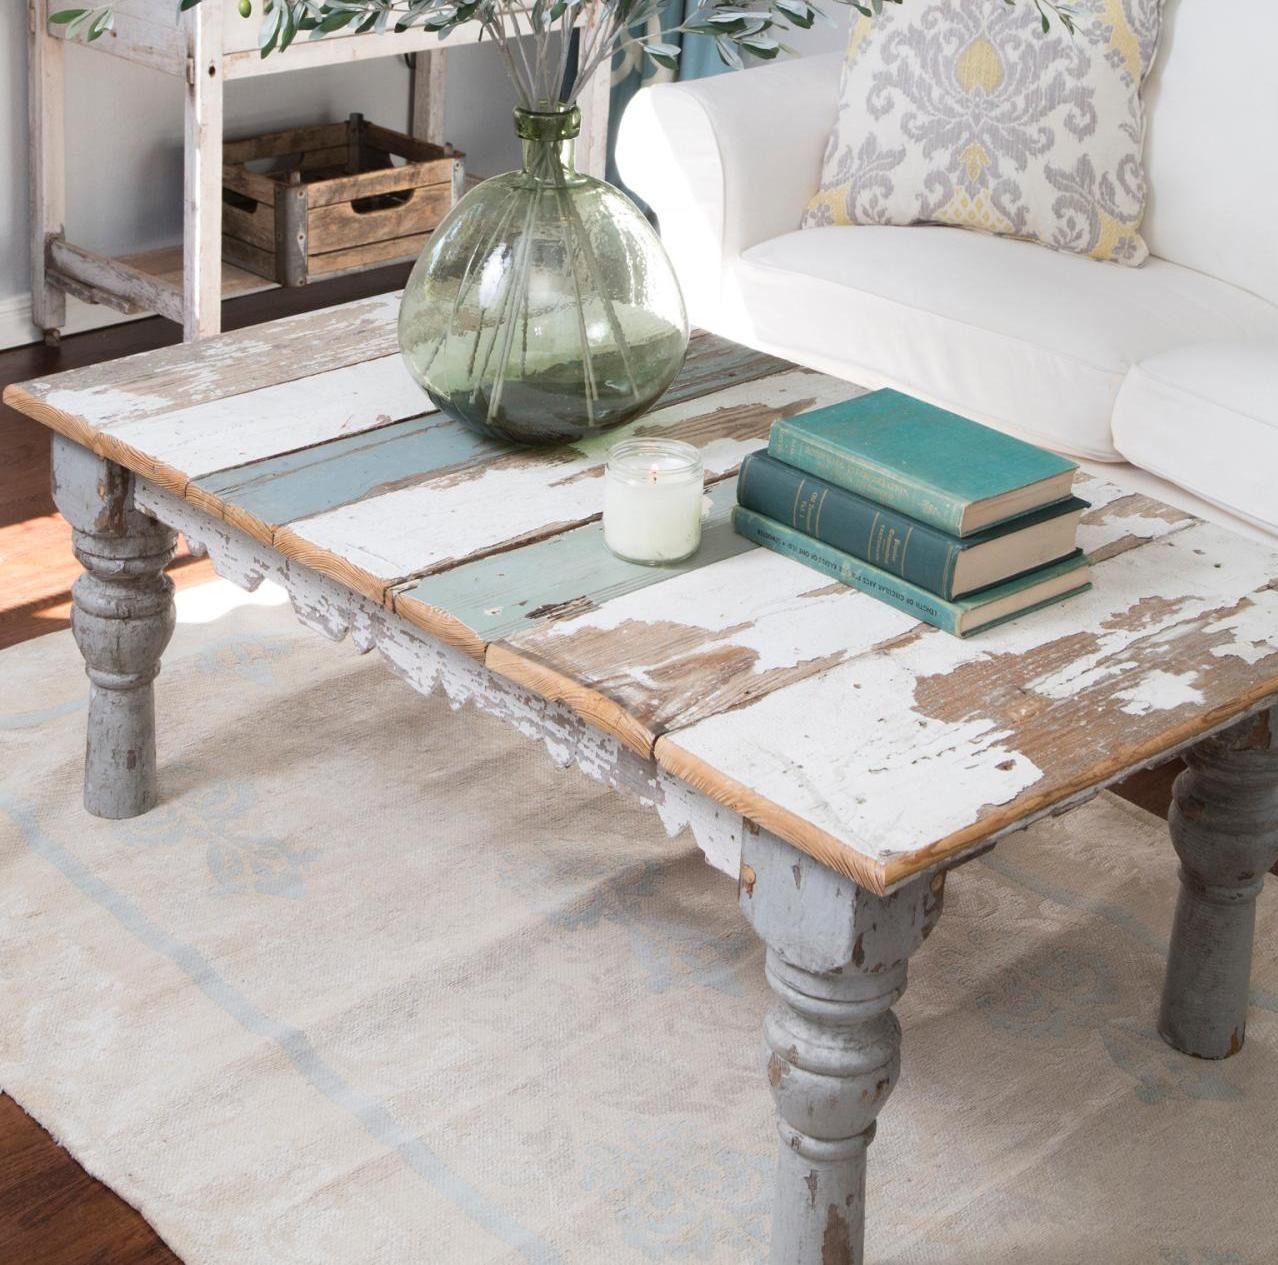 Refinishing Coffee Tables